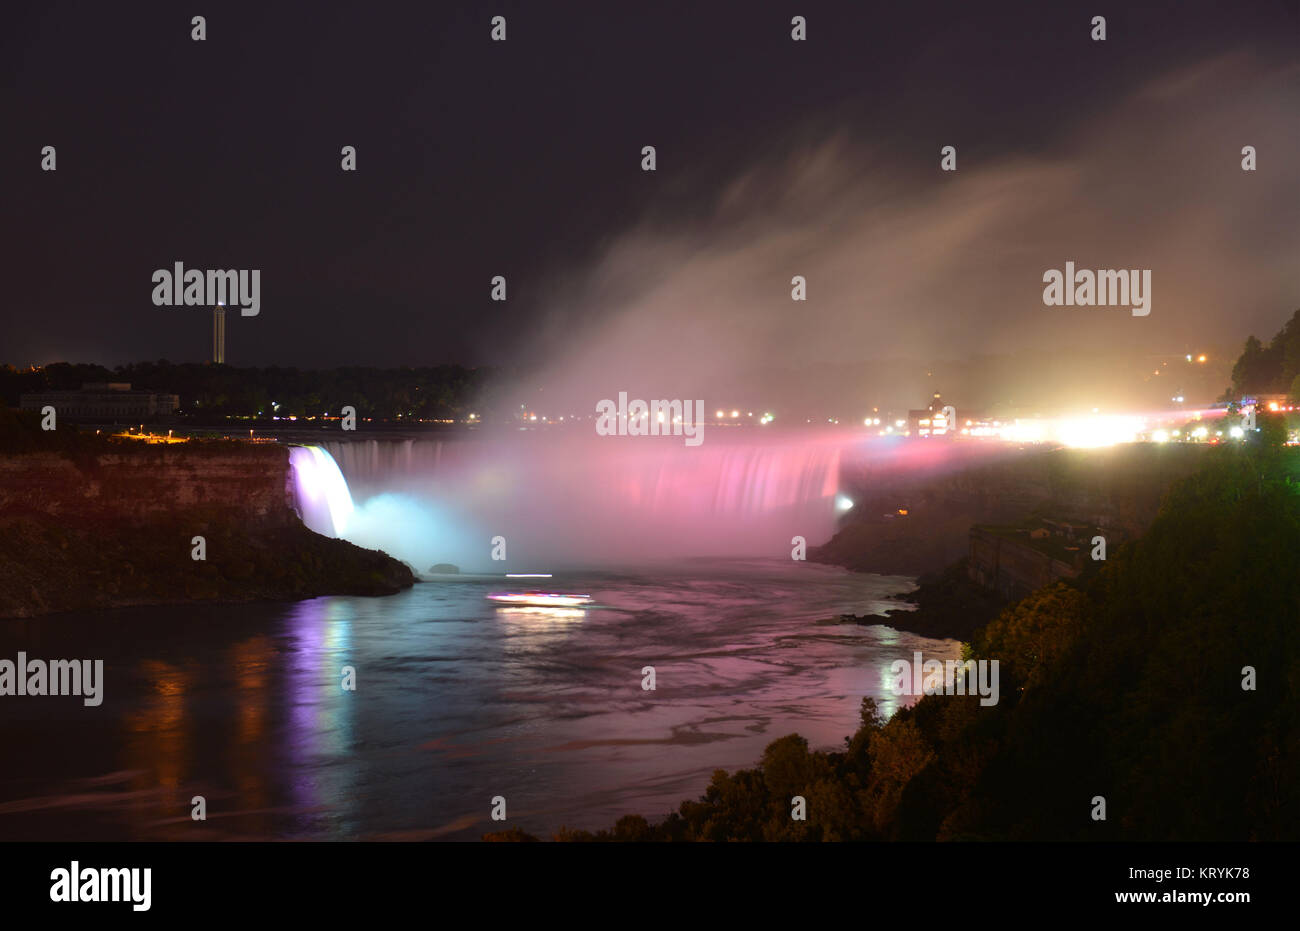 Illumination, Horseshoe of case, Niagarafaelle, Ontario, Canada / Niagaraf?lle, ´Horseshoe Falls´, Kanada - Stock Image